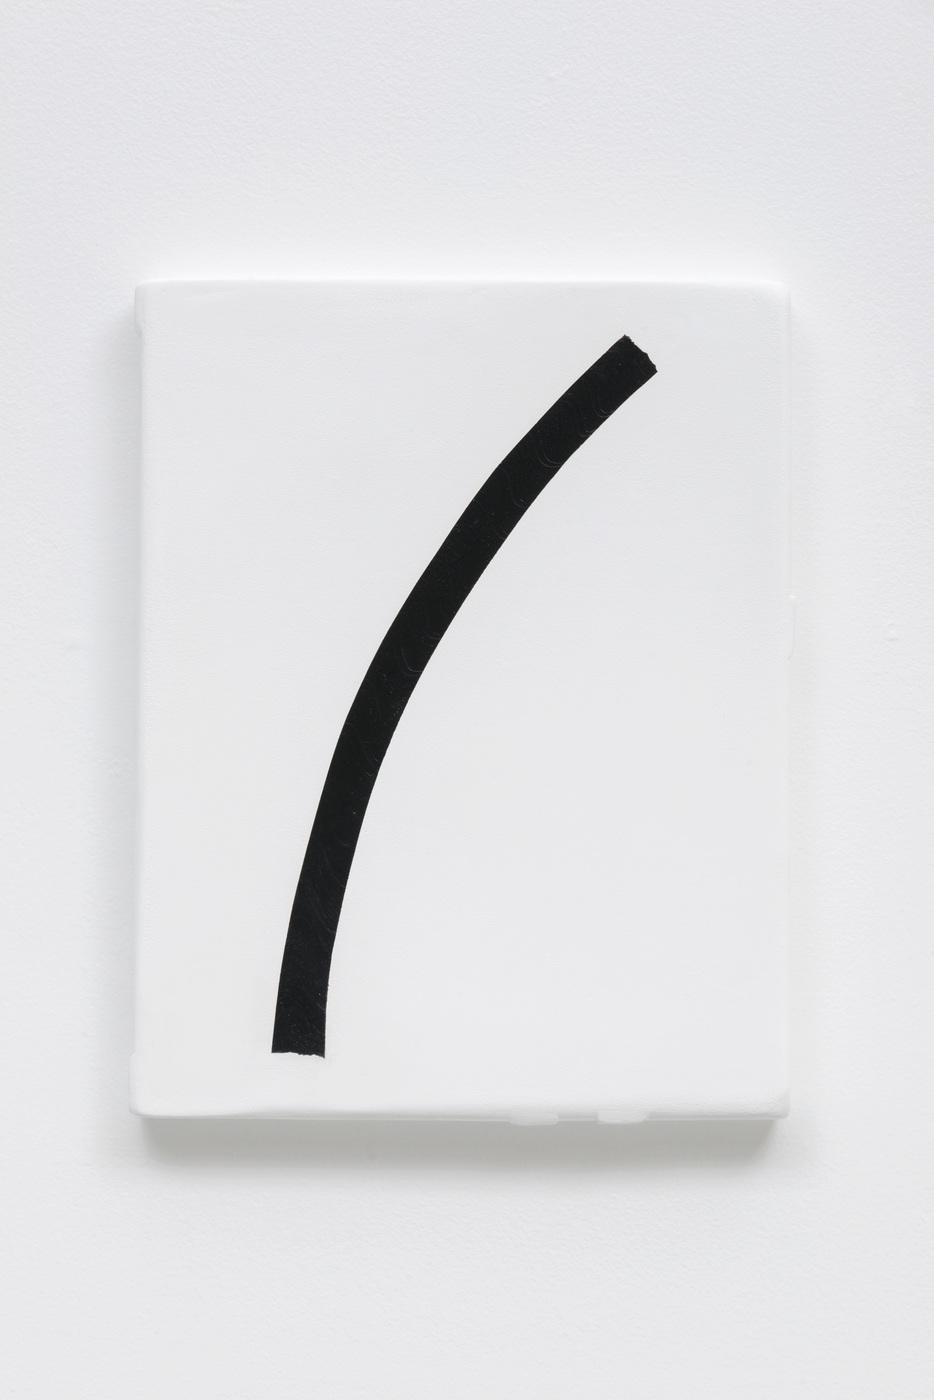 Jennifer Remenchik - Untitled (Black)